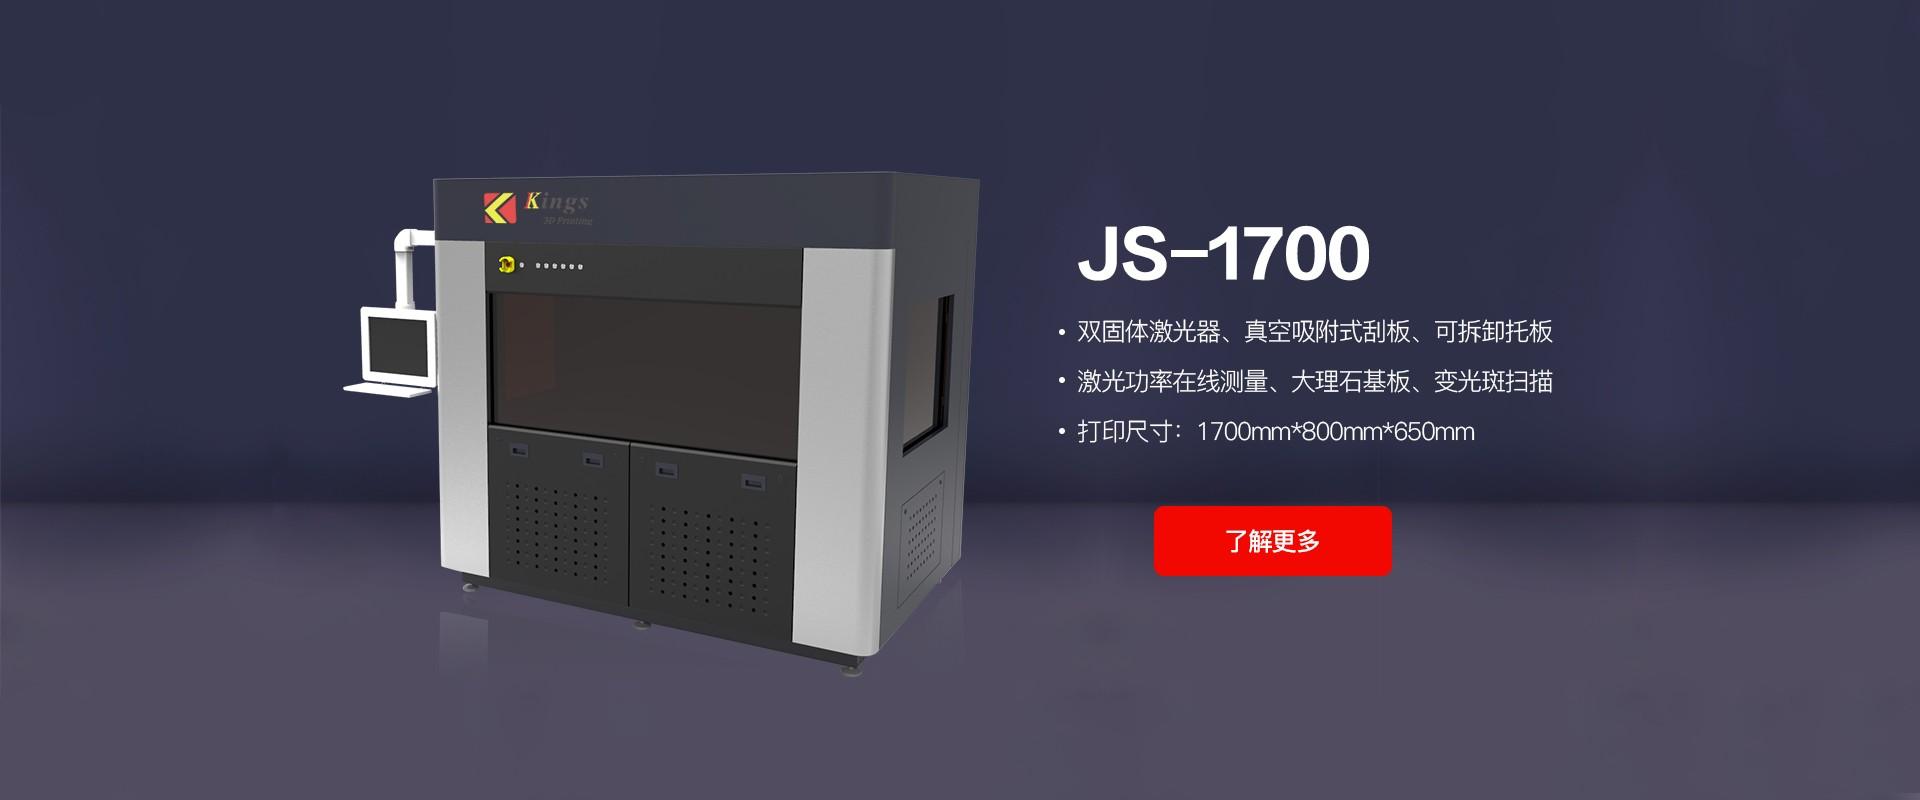 JS-1700